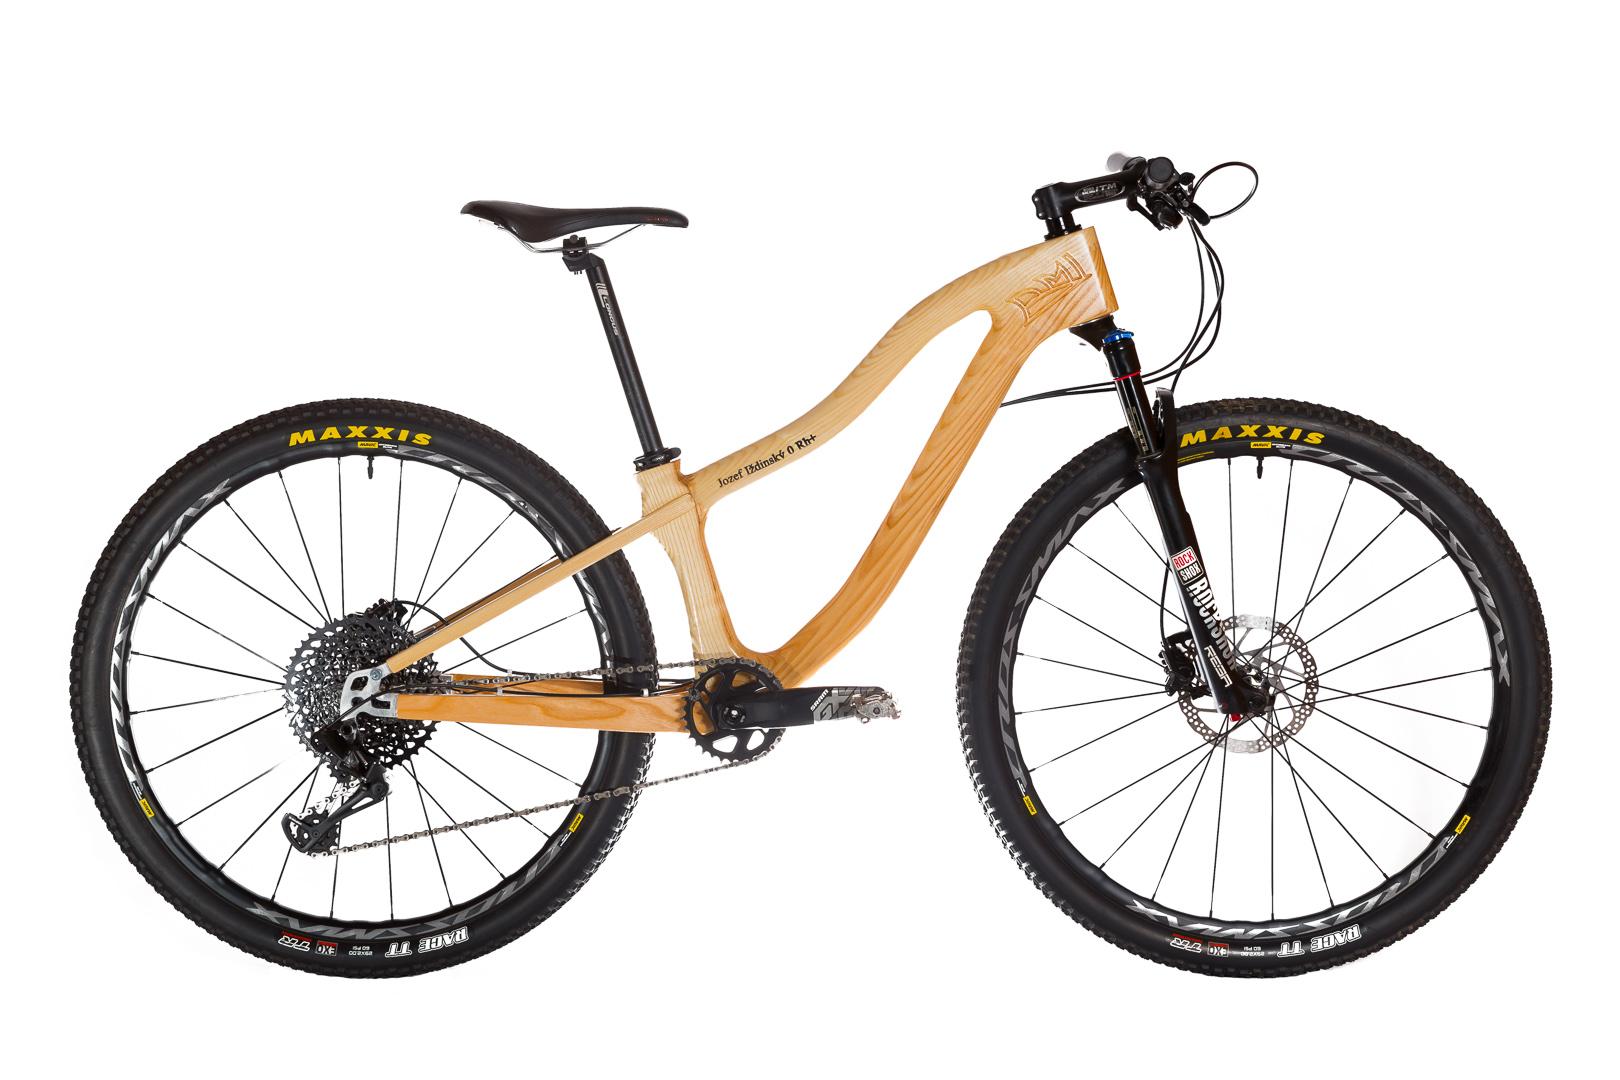 Wooden Adventurer 29 Boost